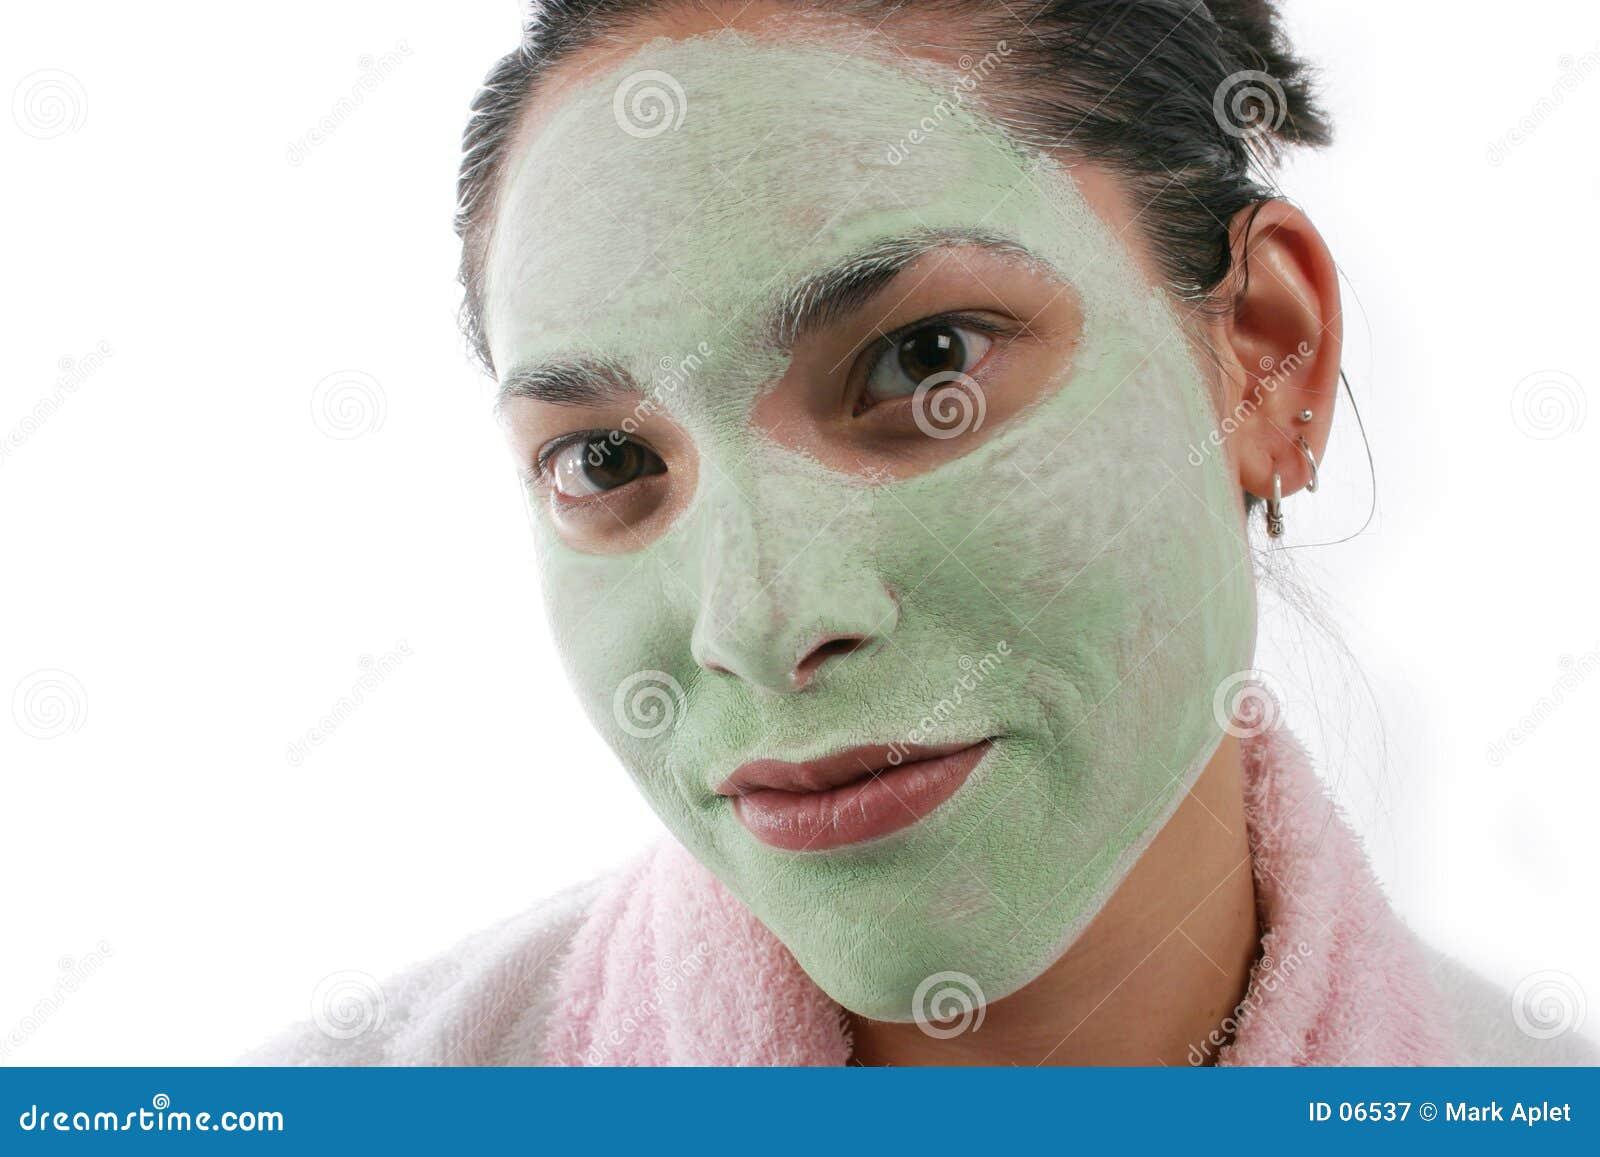 Station thermale et massage facial